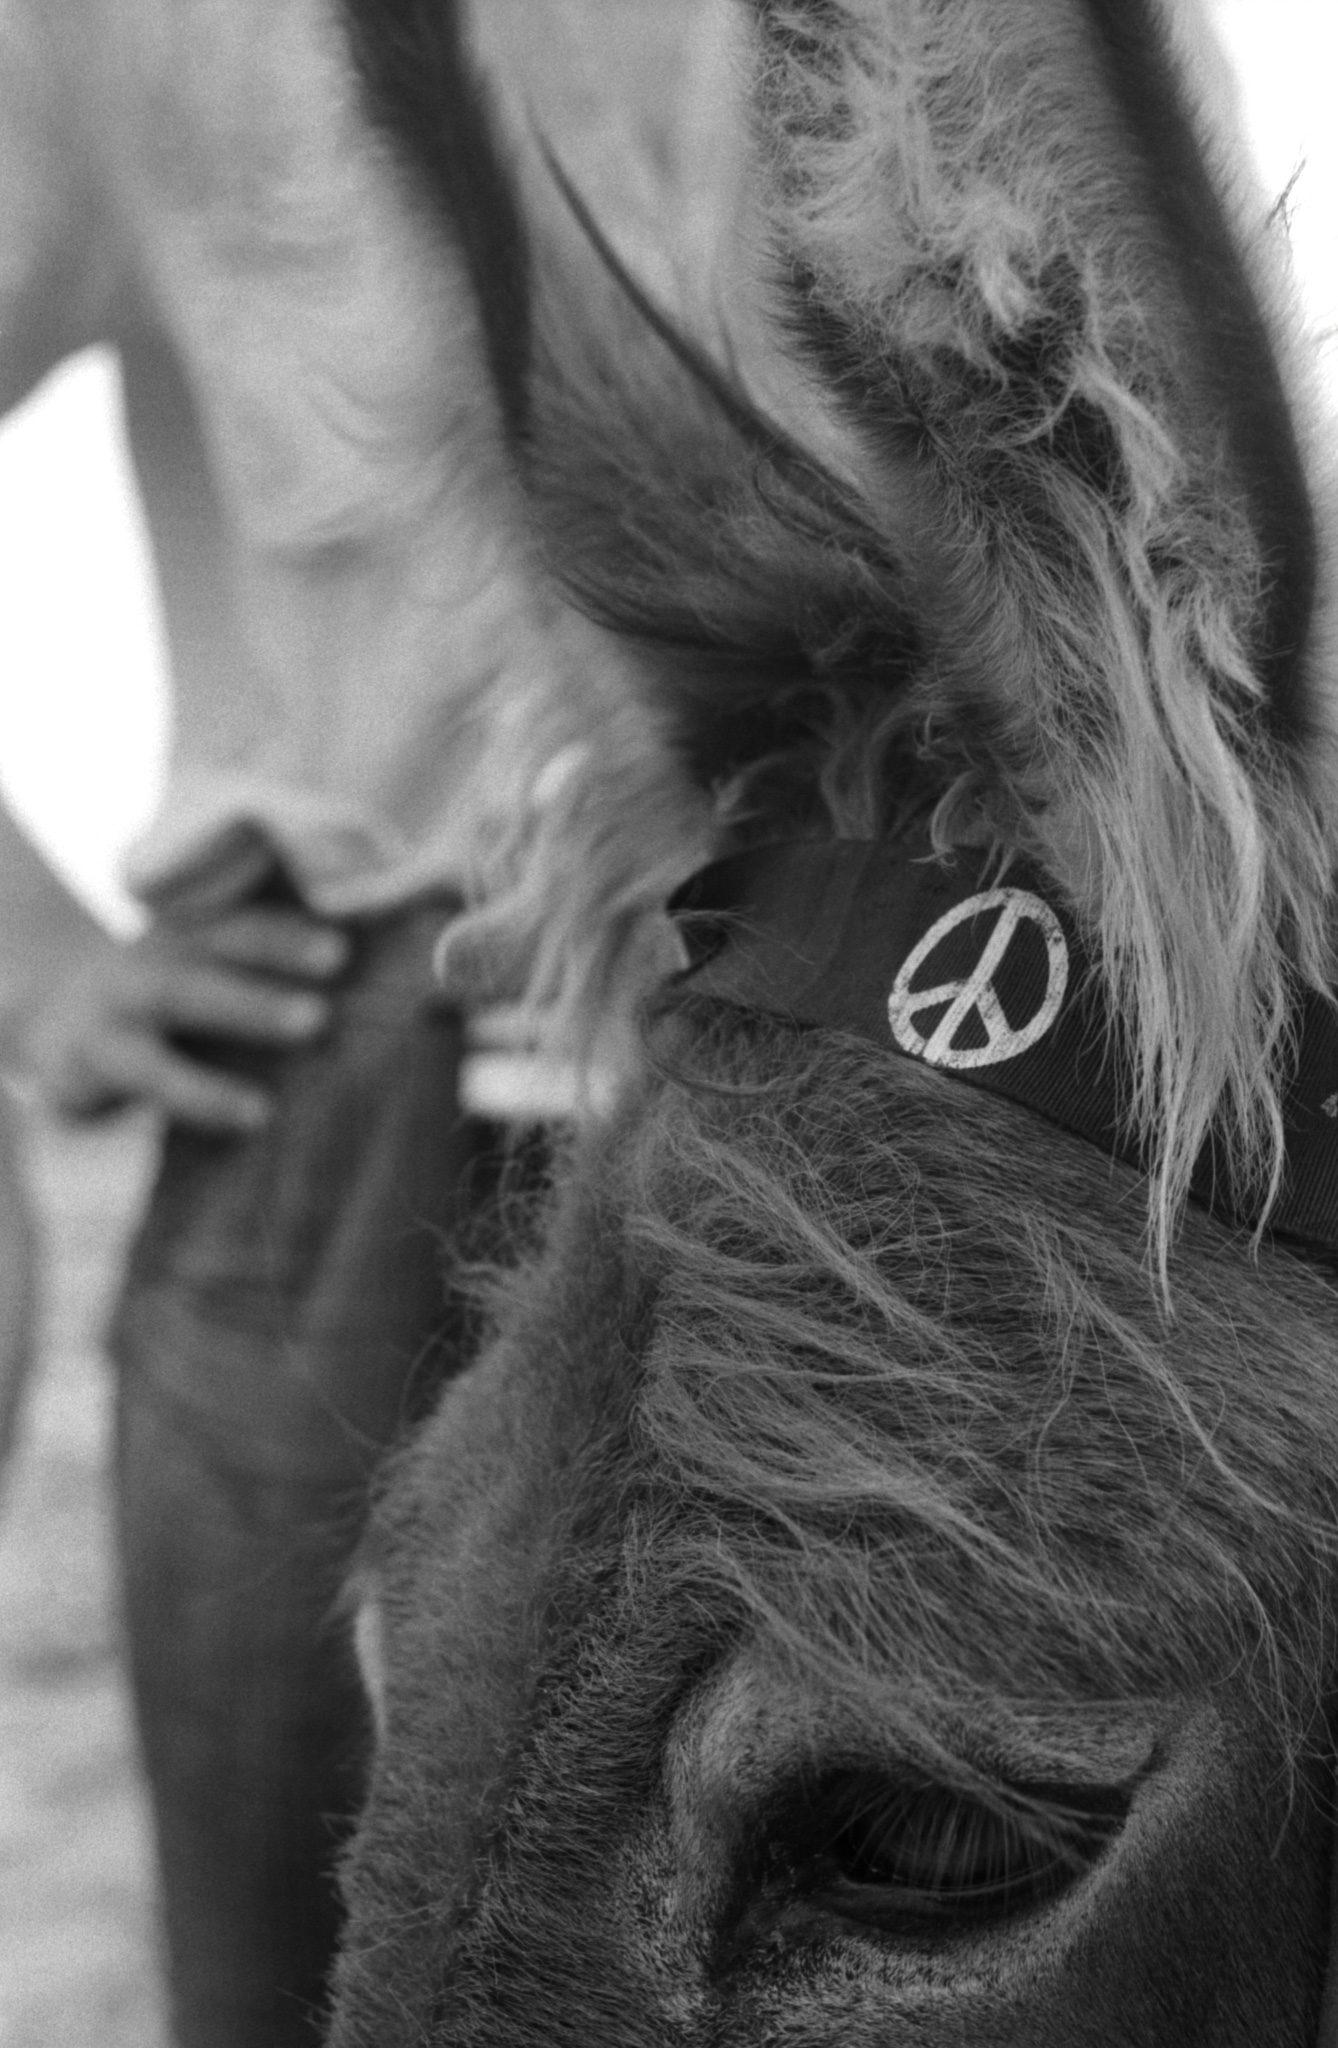 CND donkey